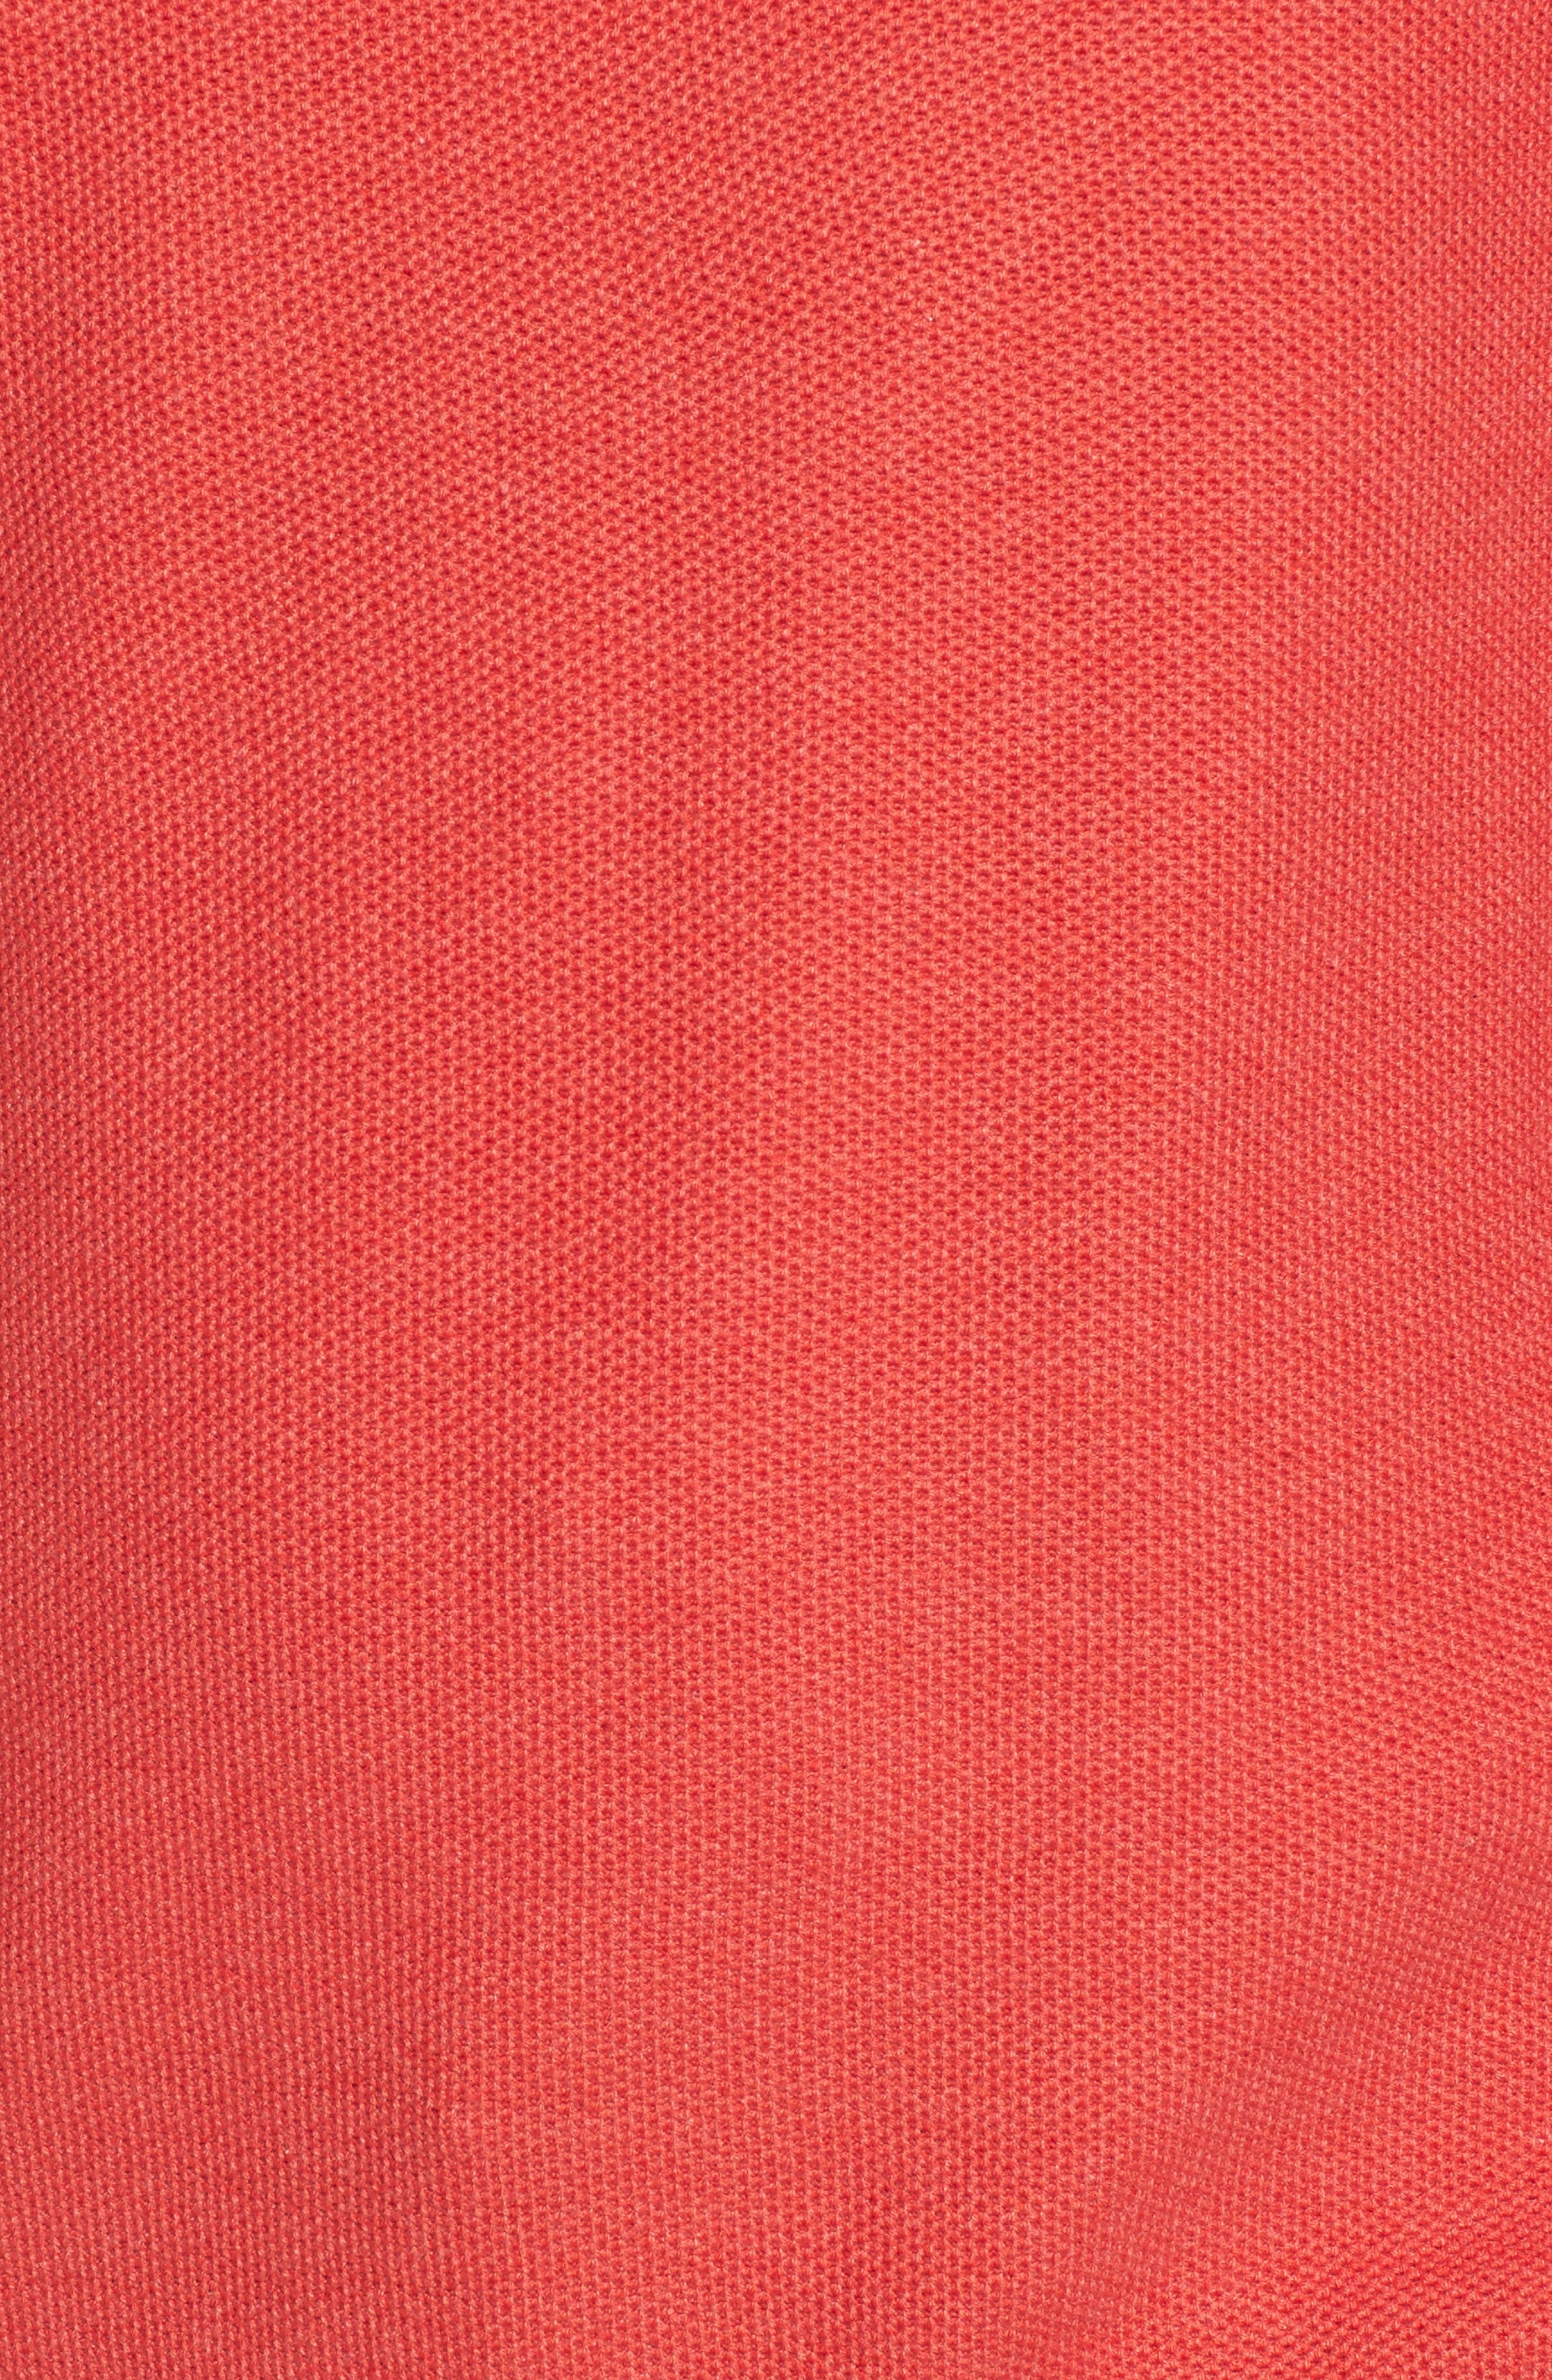 Sorrel Tipped Quarter Zip Sweater,                             Alternate thumbnail 5, color,                             950